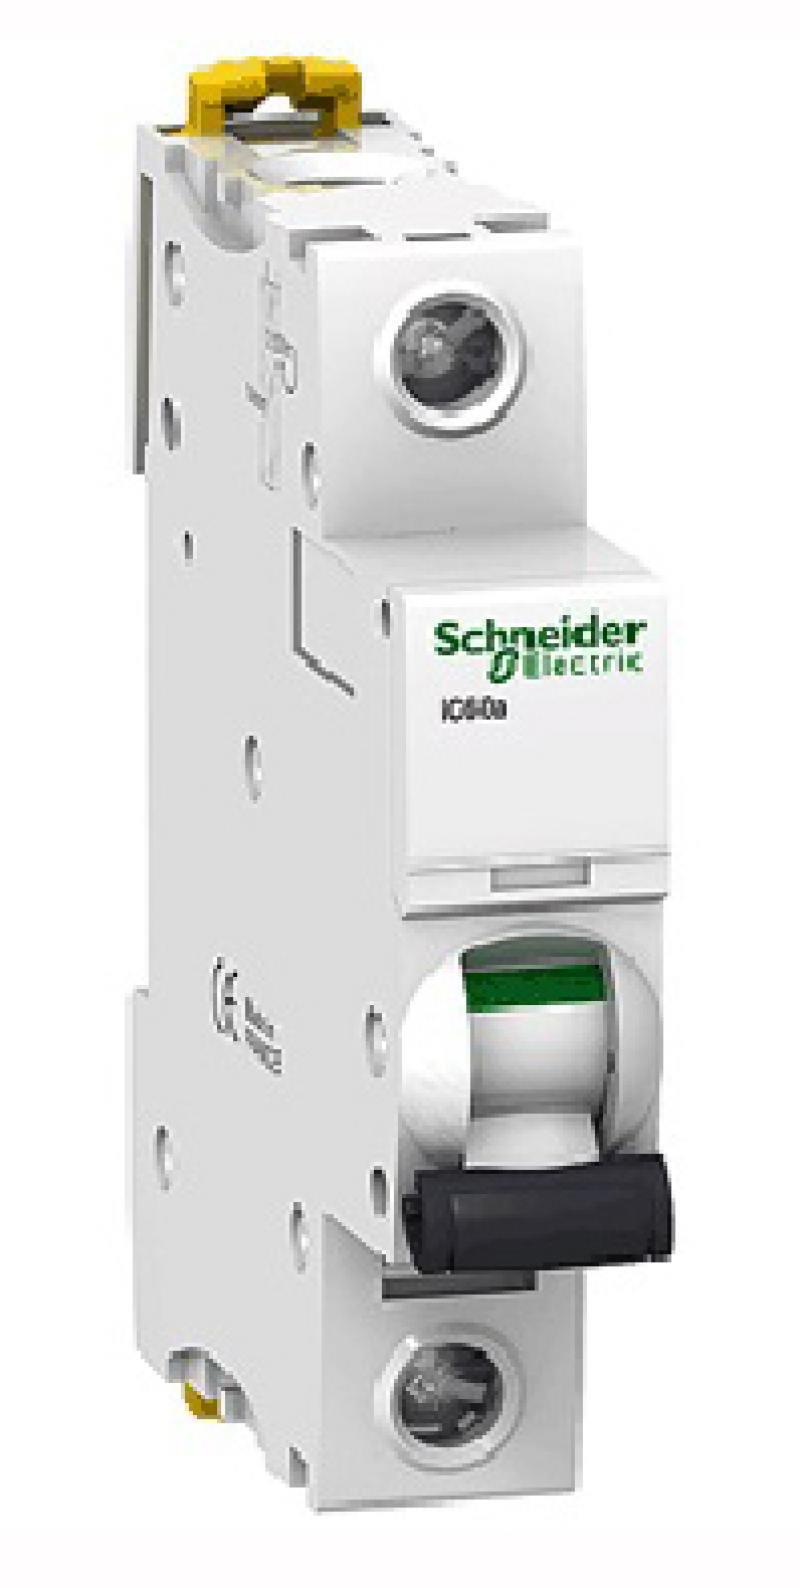 Автоматический выключатель Schneider Electric iC60N 1П 40A B A9F78140 панель лицевая schneider electric actassi 1 модуль белый 24 шт vdi88240